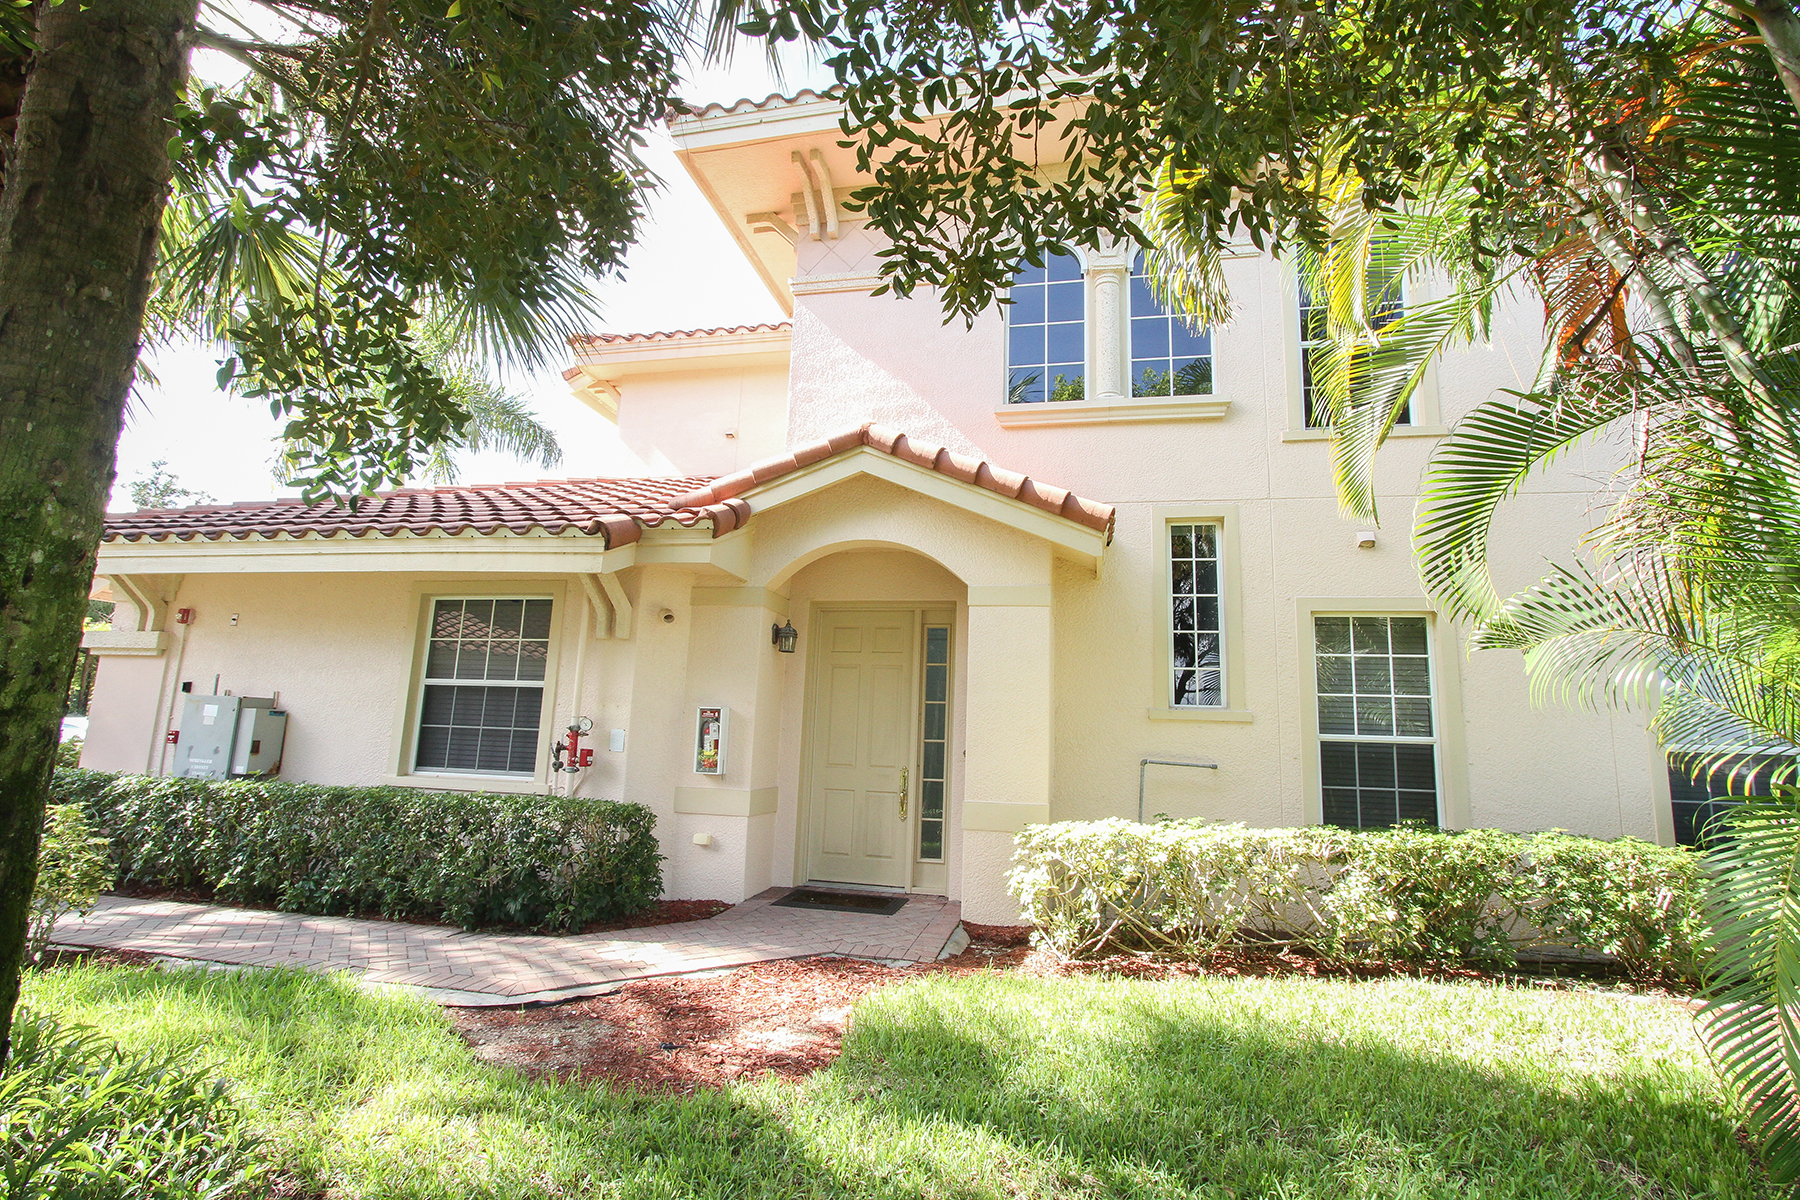 Condominium for Rent at FIDDLERS CREEK - SERENA 3191 Serenity Ct 6-202, Naples, Florida 34114 United States